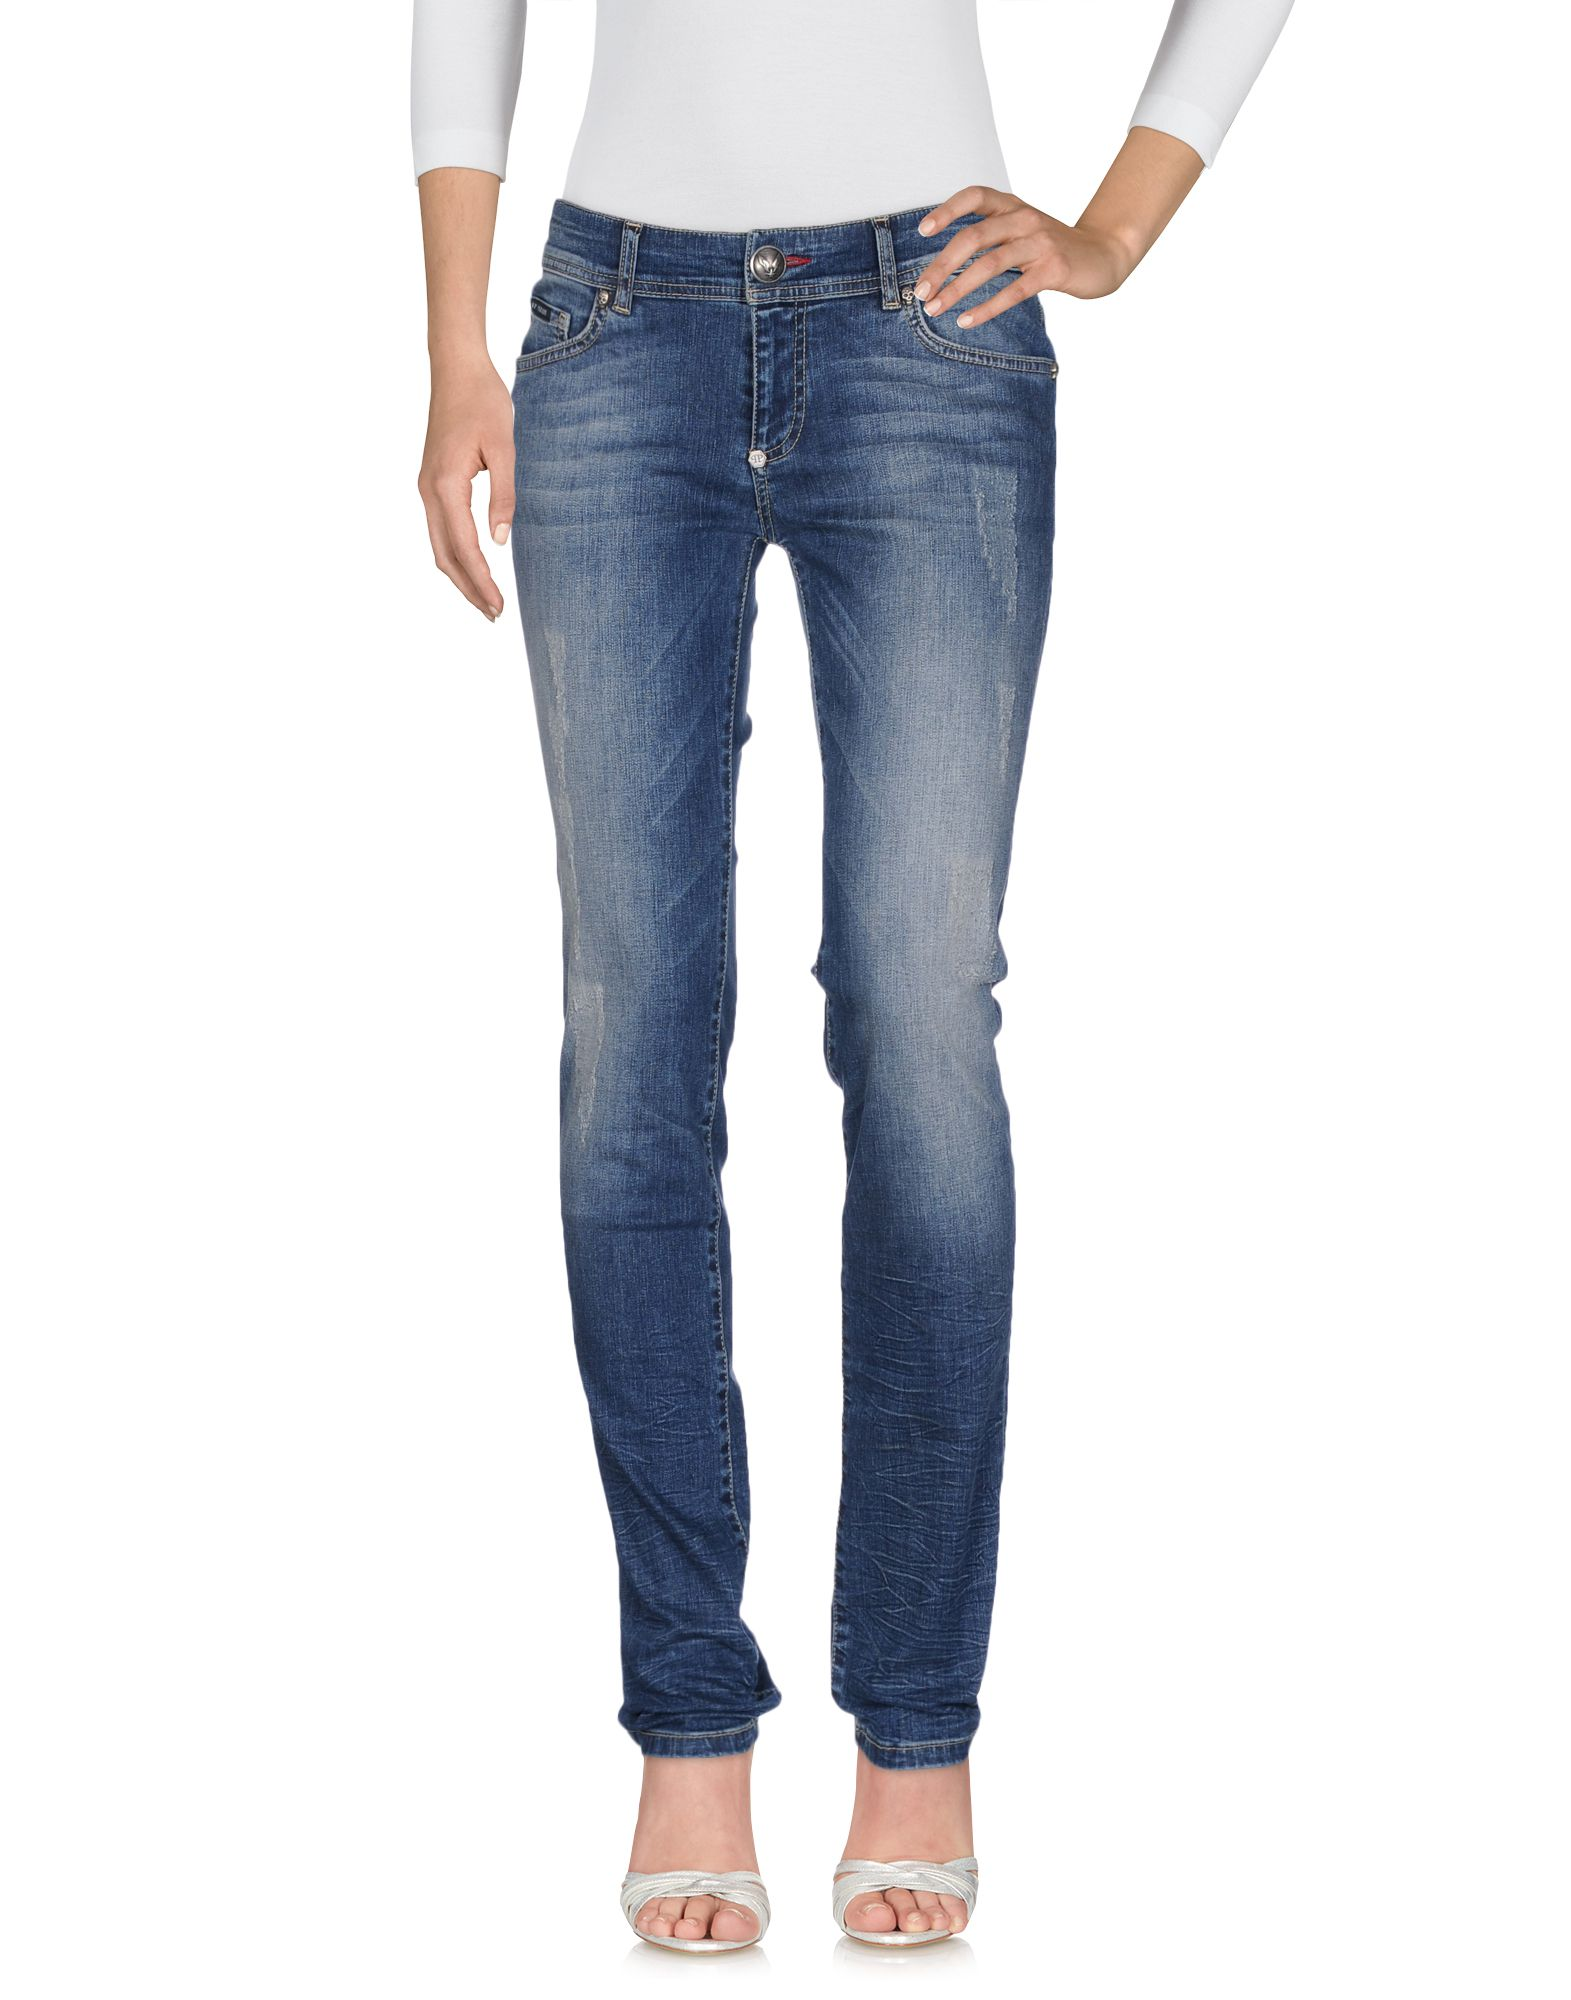 Pantaloni Jeans Philipp Plein Donna - Acquista online su